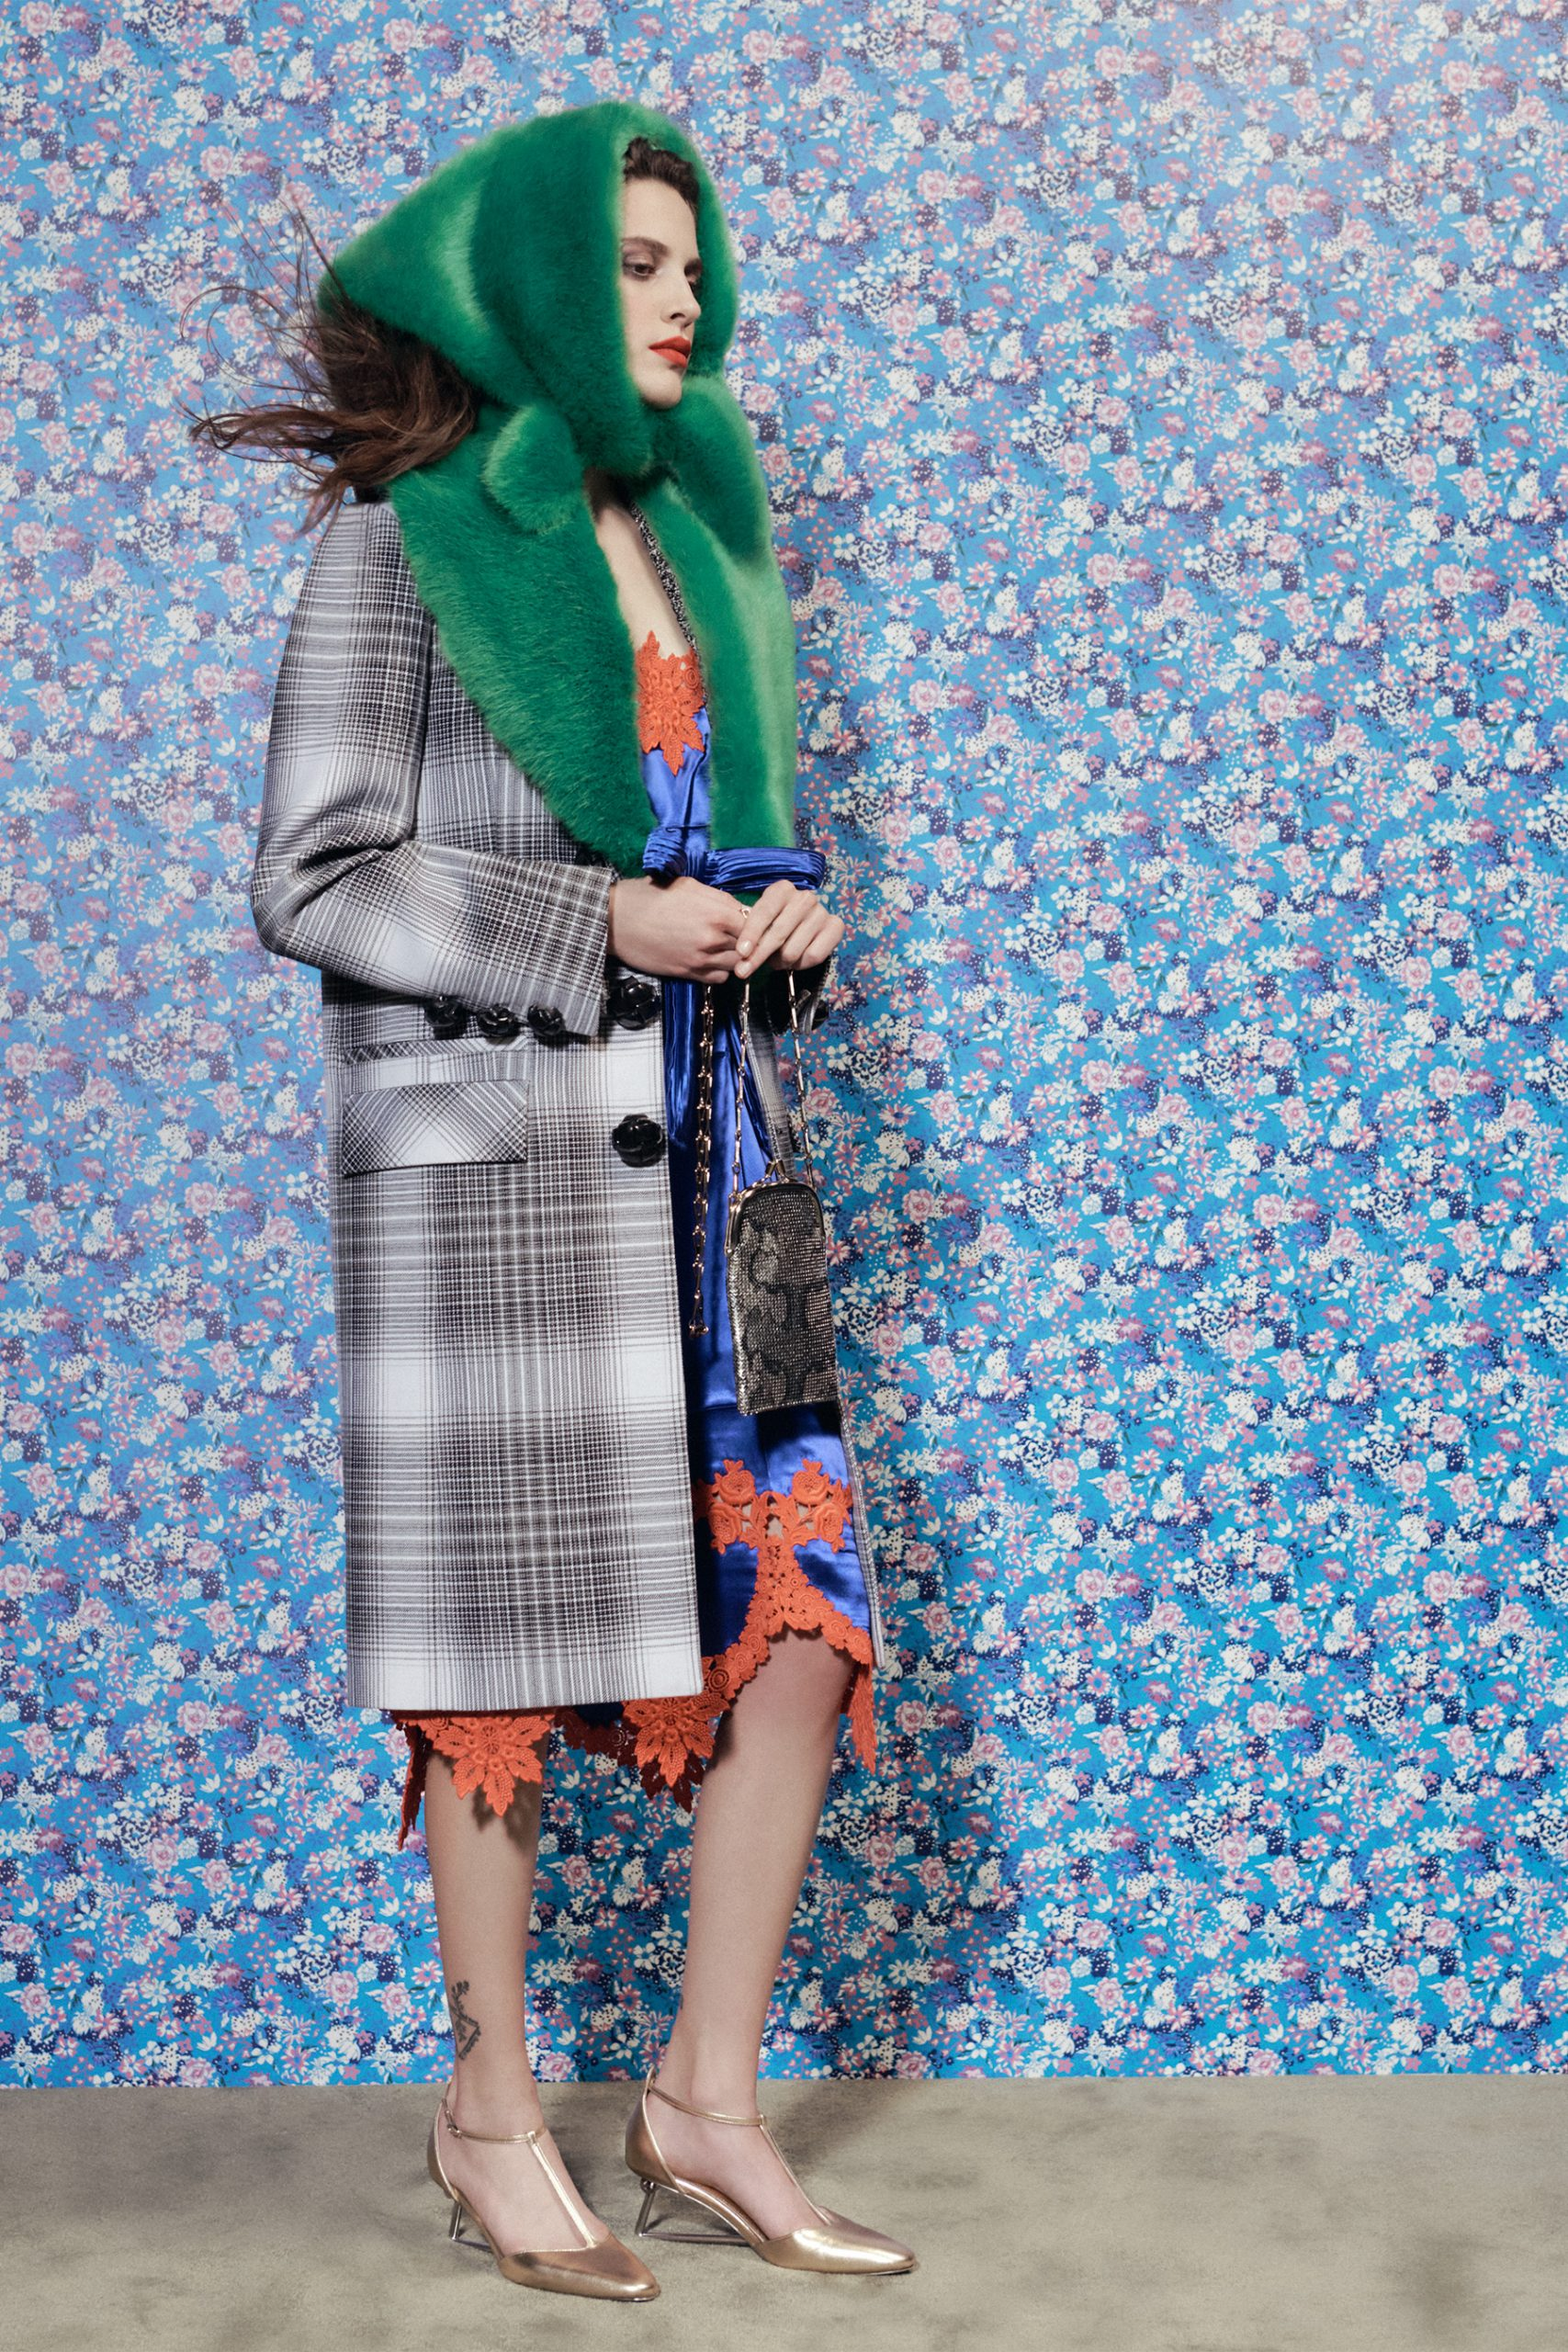 Takahiromiyashita The Soloist, Paco Rabanne, Kenneth Ize Fall 2021 Fashion Show Review